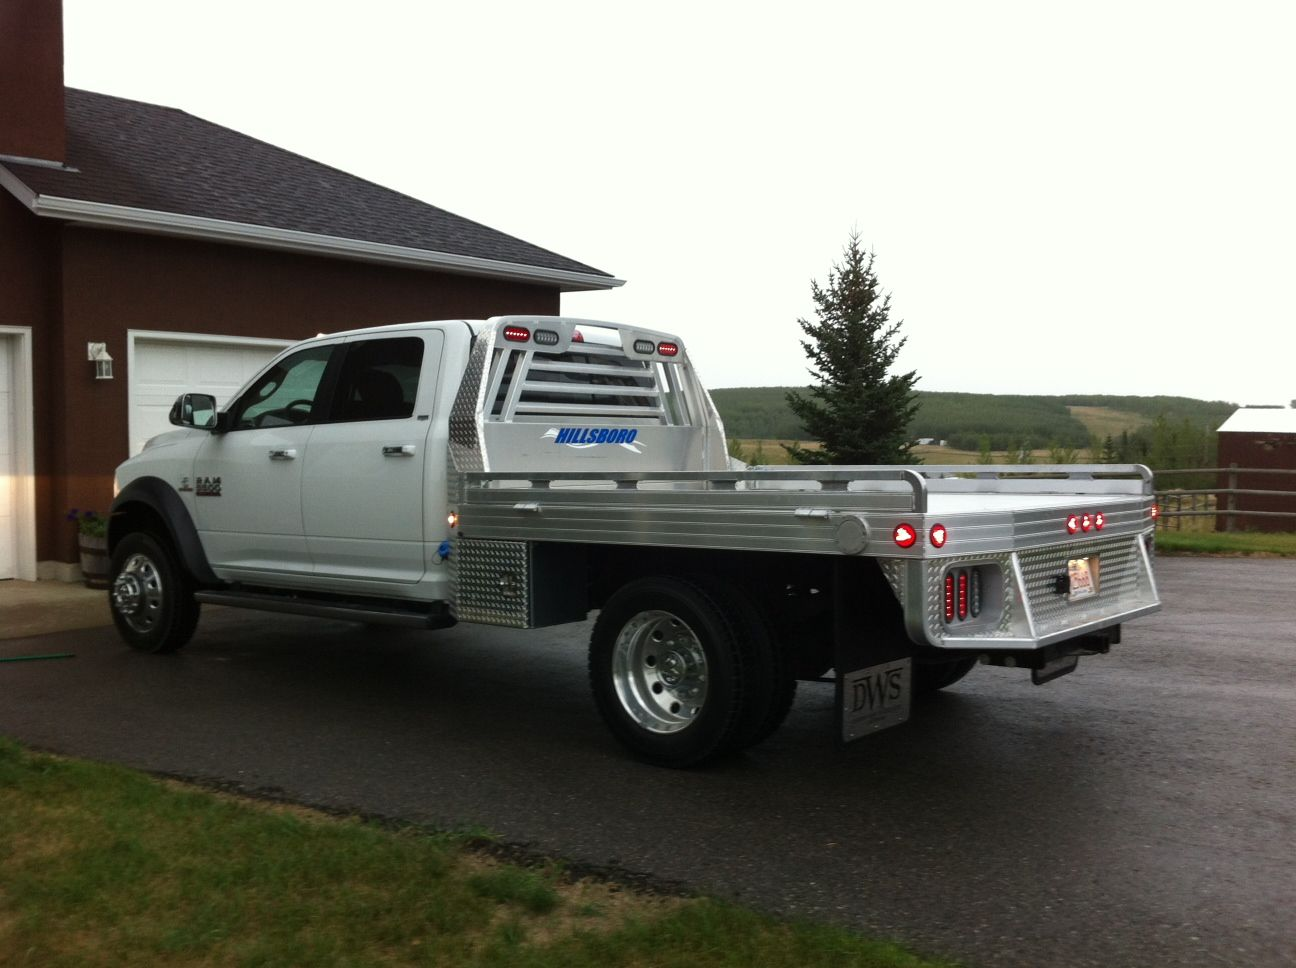 Courtesy of Diamond West Sales Aluminum truck beds